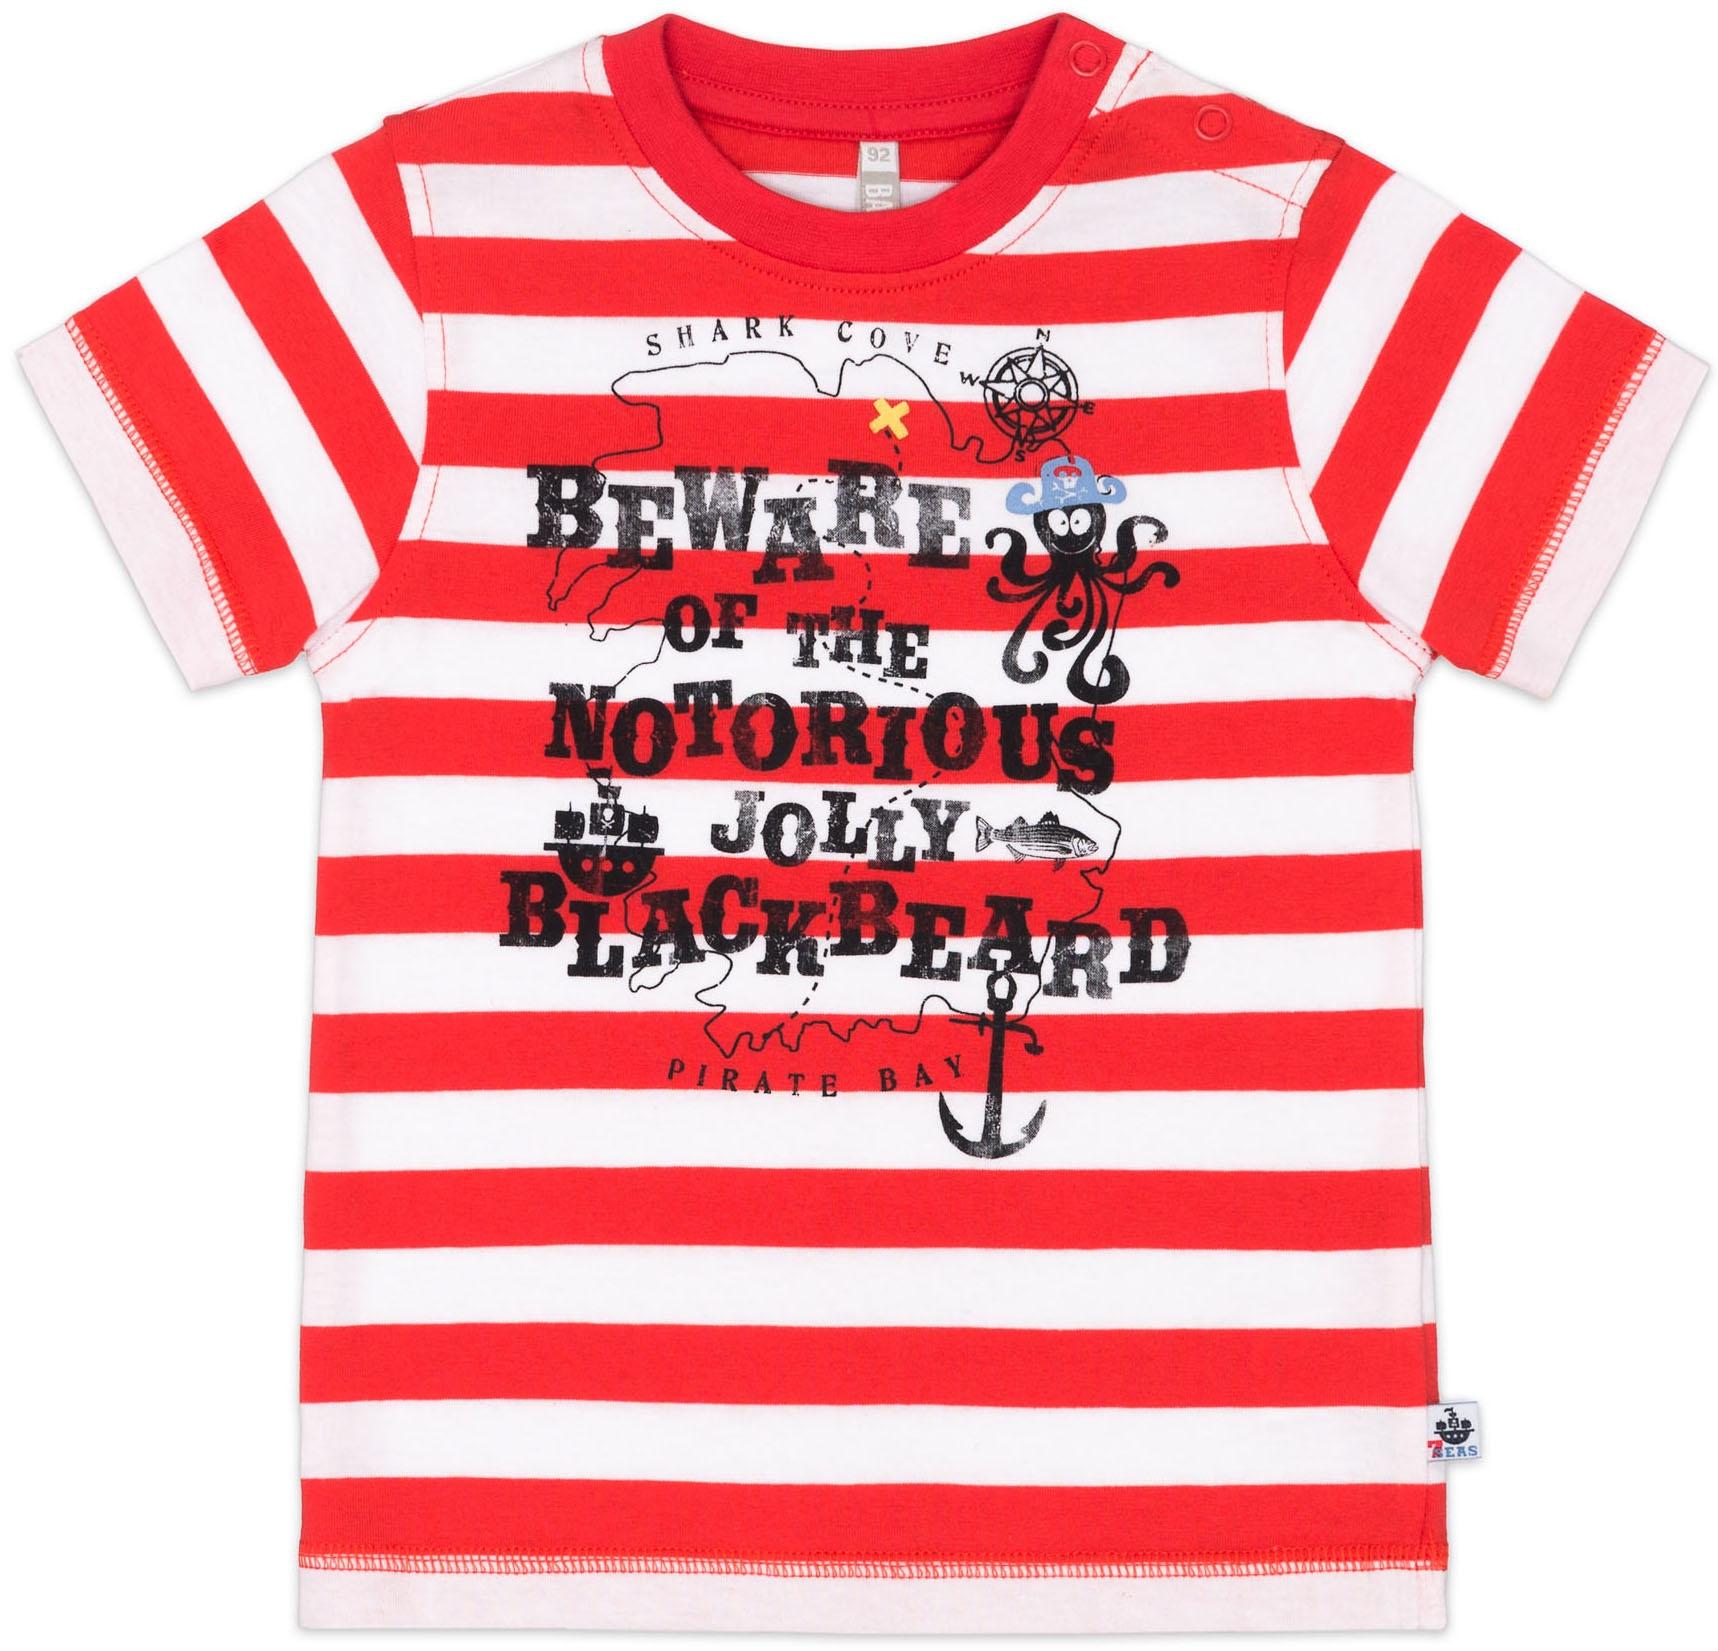 Футболки Barkito Футболка с коротким рукавом для мальчика Barkito, Пираты семи морей, красно-белая, с рисунком полоска